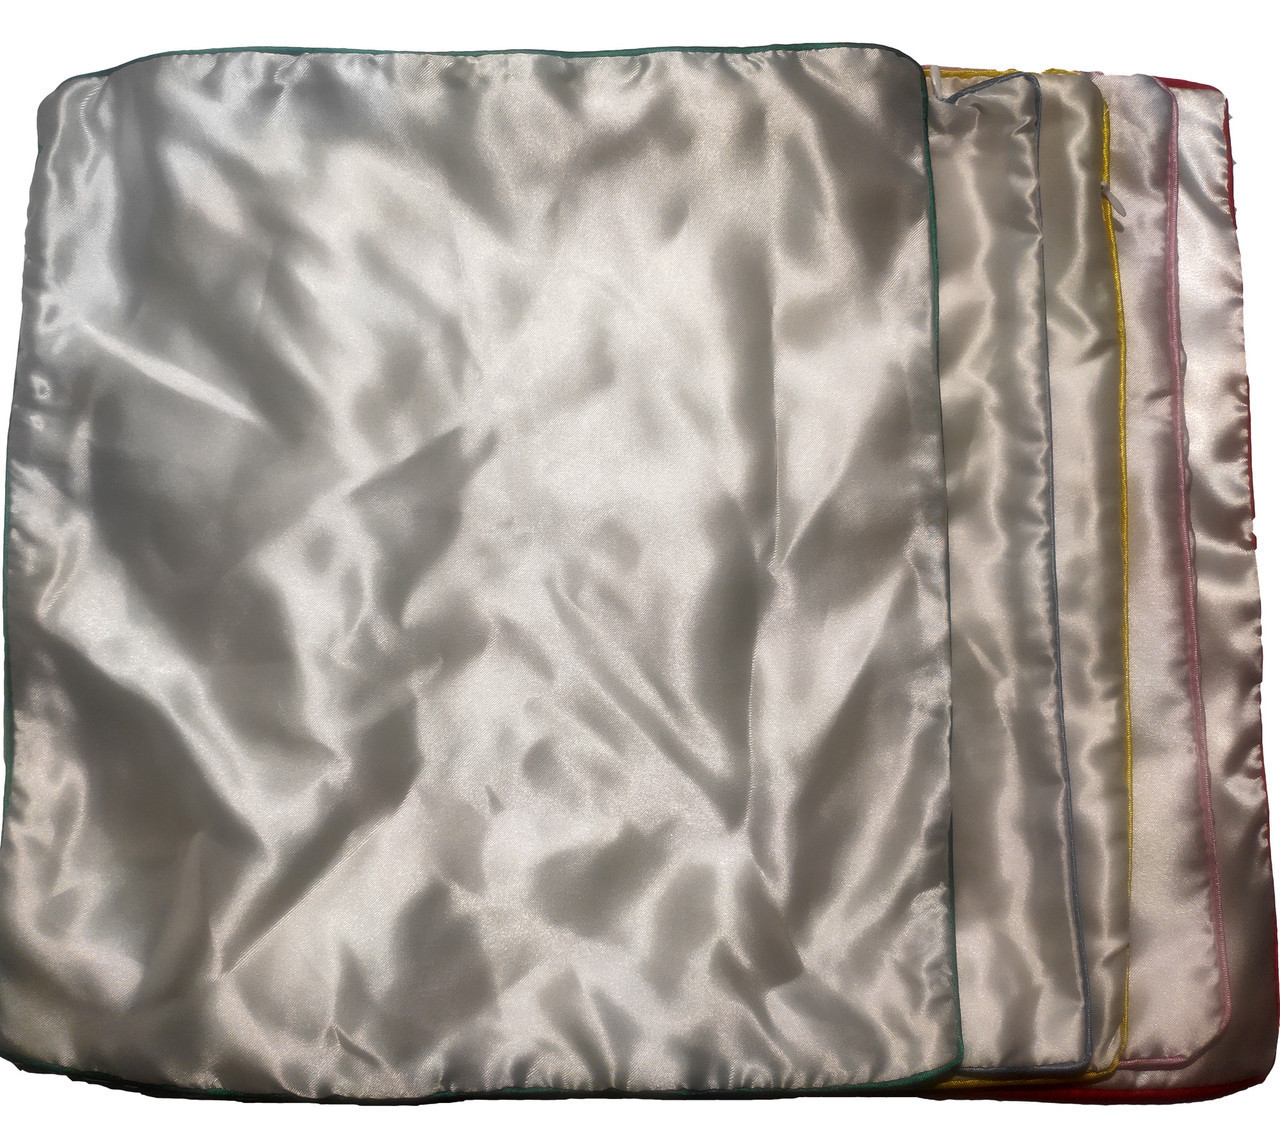 Подушка сублимационная атласная цветная с КАНТОМ 35х35 РОЗОВЫЙ